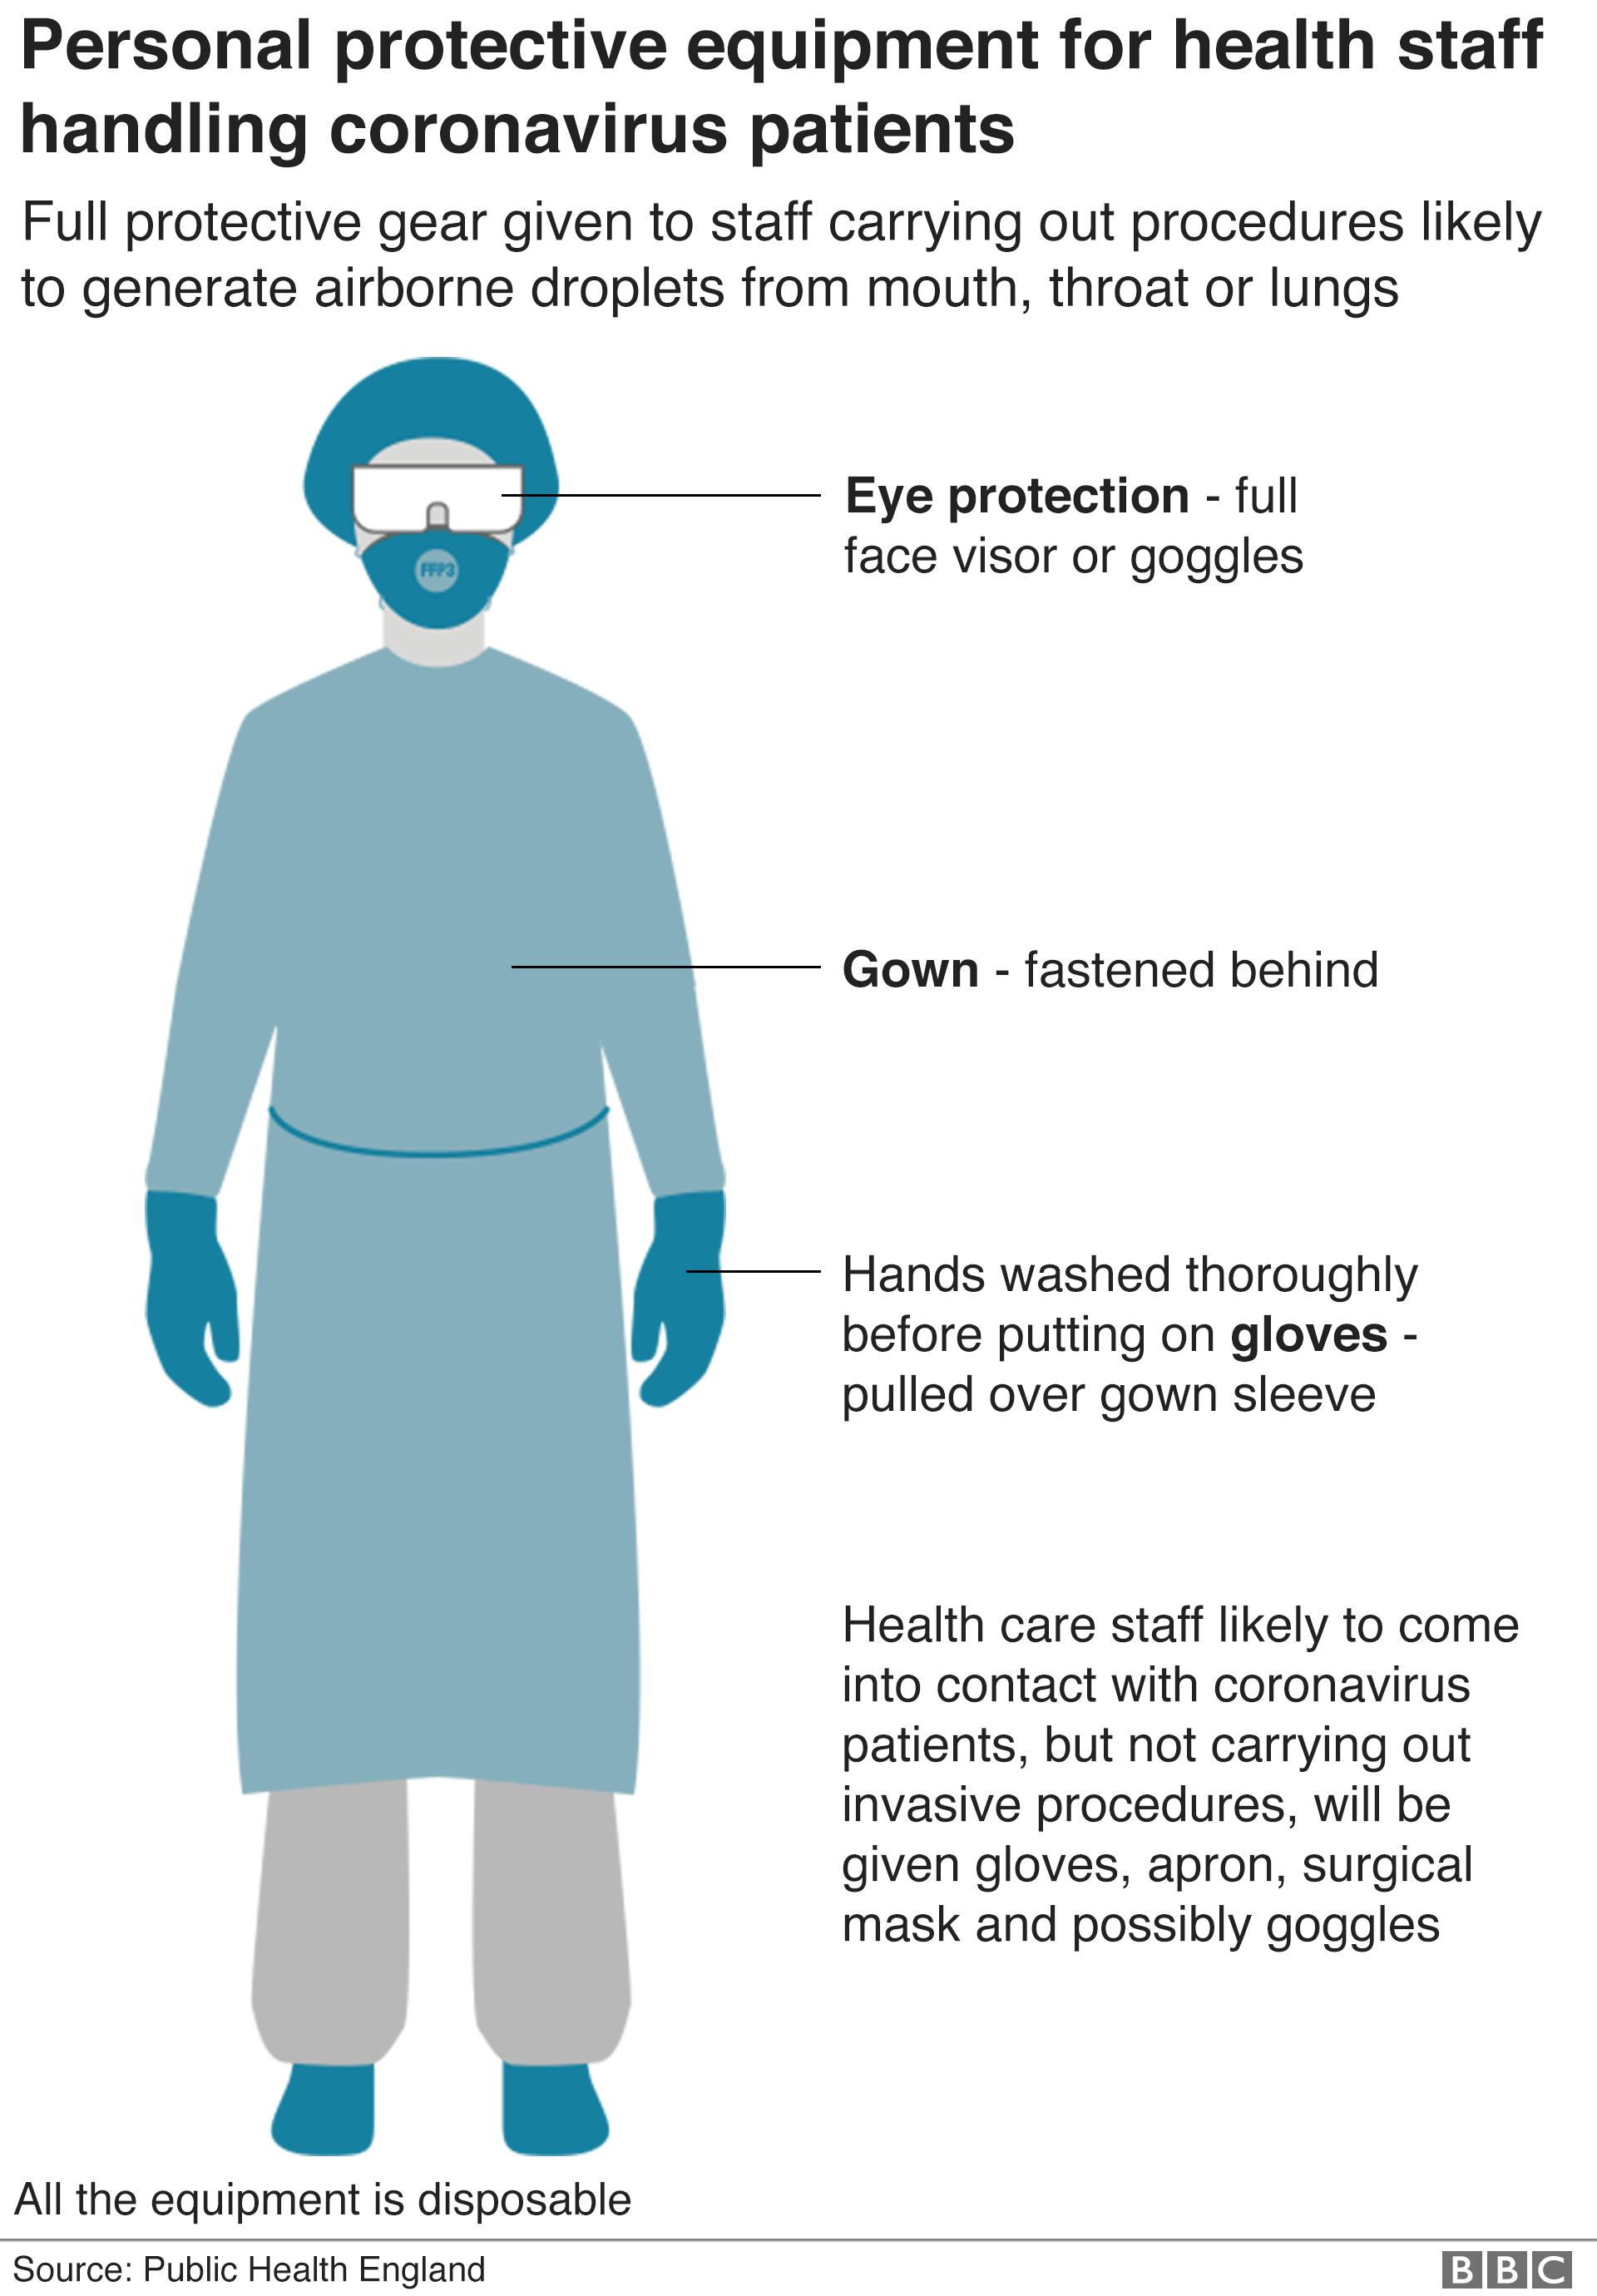 Graphic showing personal protective equipment for health staff handling coronavirus staff